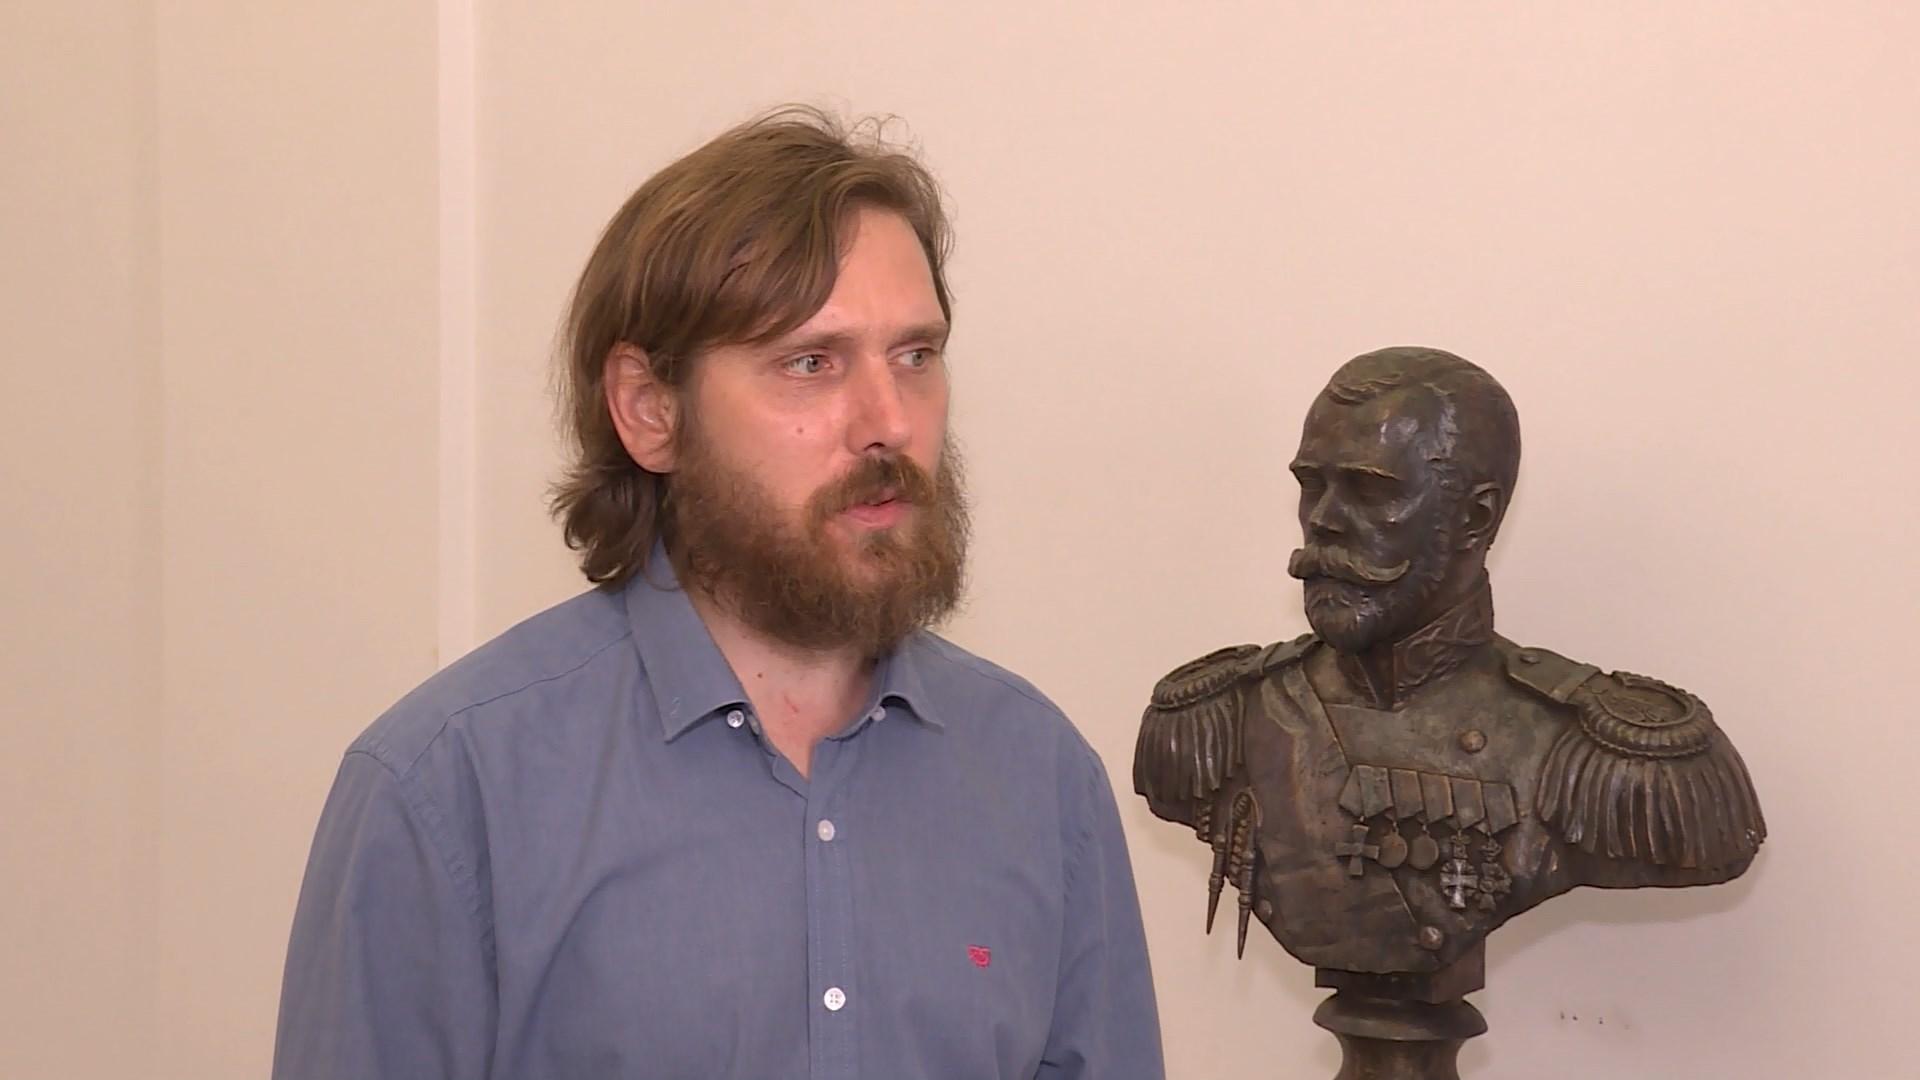 В холле Романовского музея в Костроме установили бюст императора Николая II